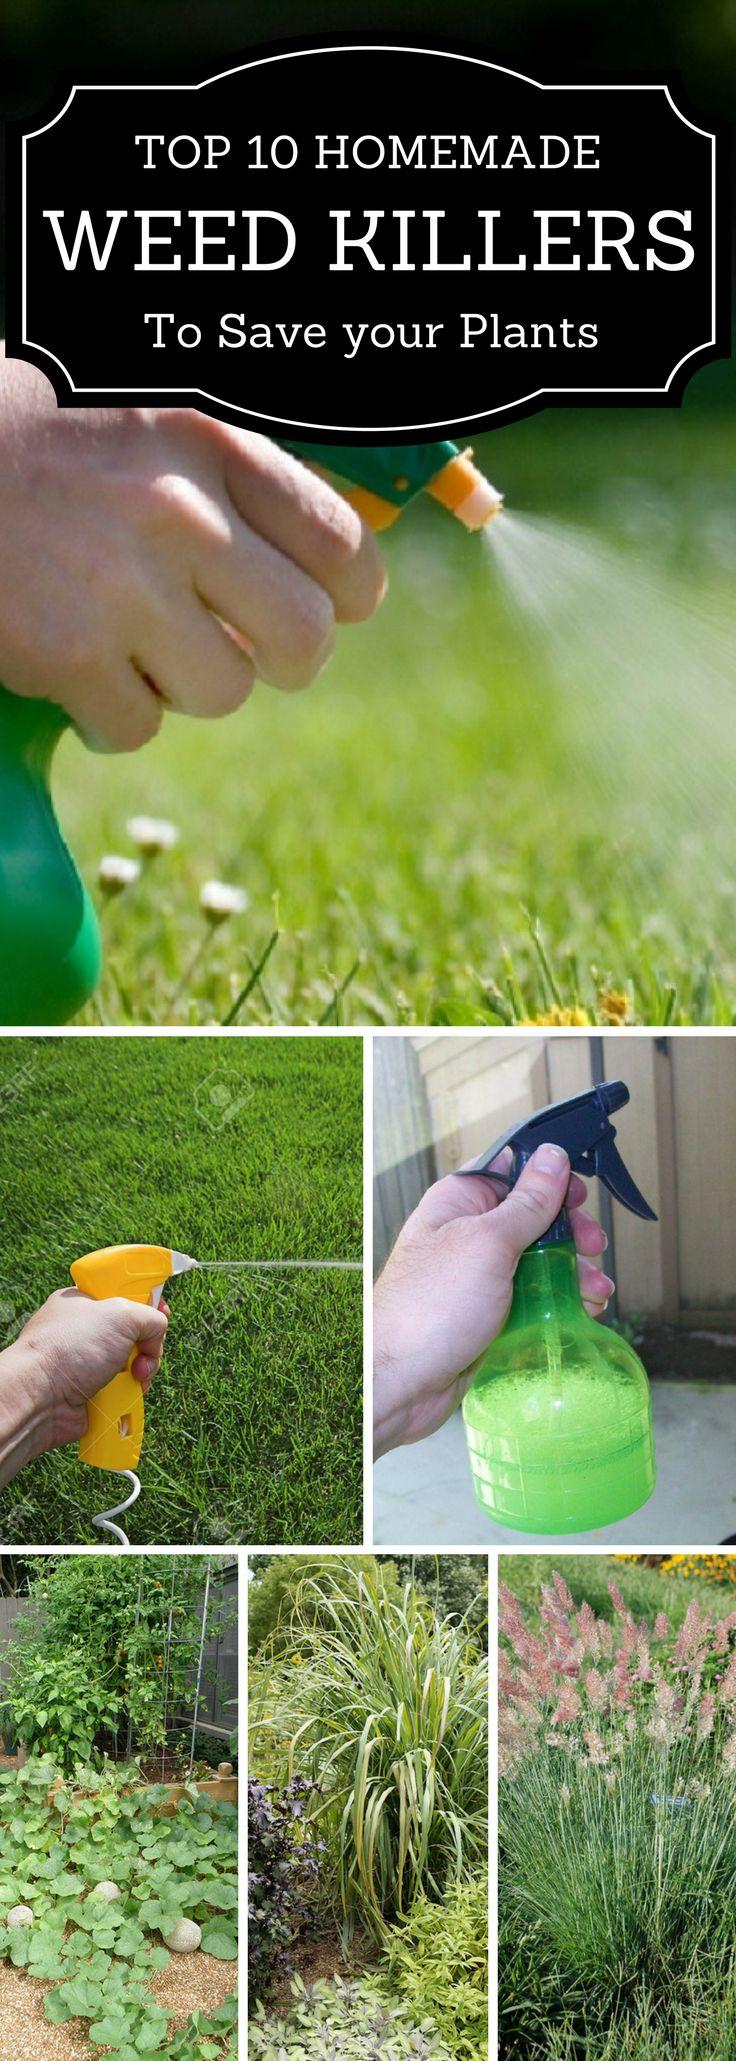 Weeds in flower beds organic killer - Top 10 Organic Homemade Weed Killers